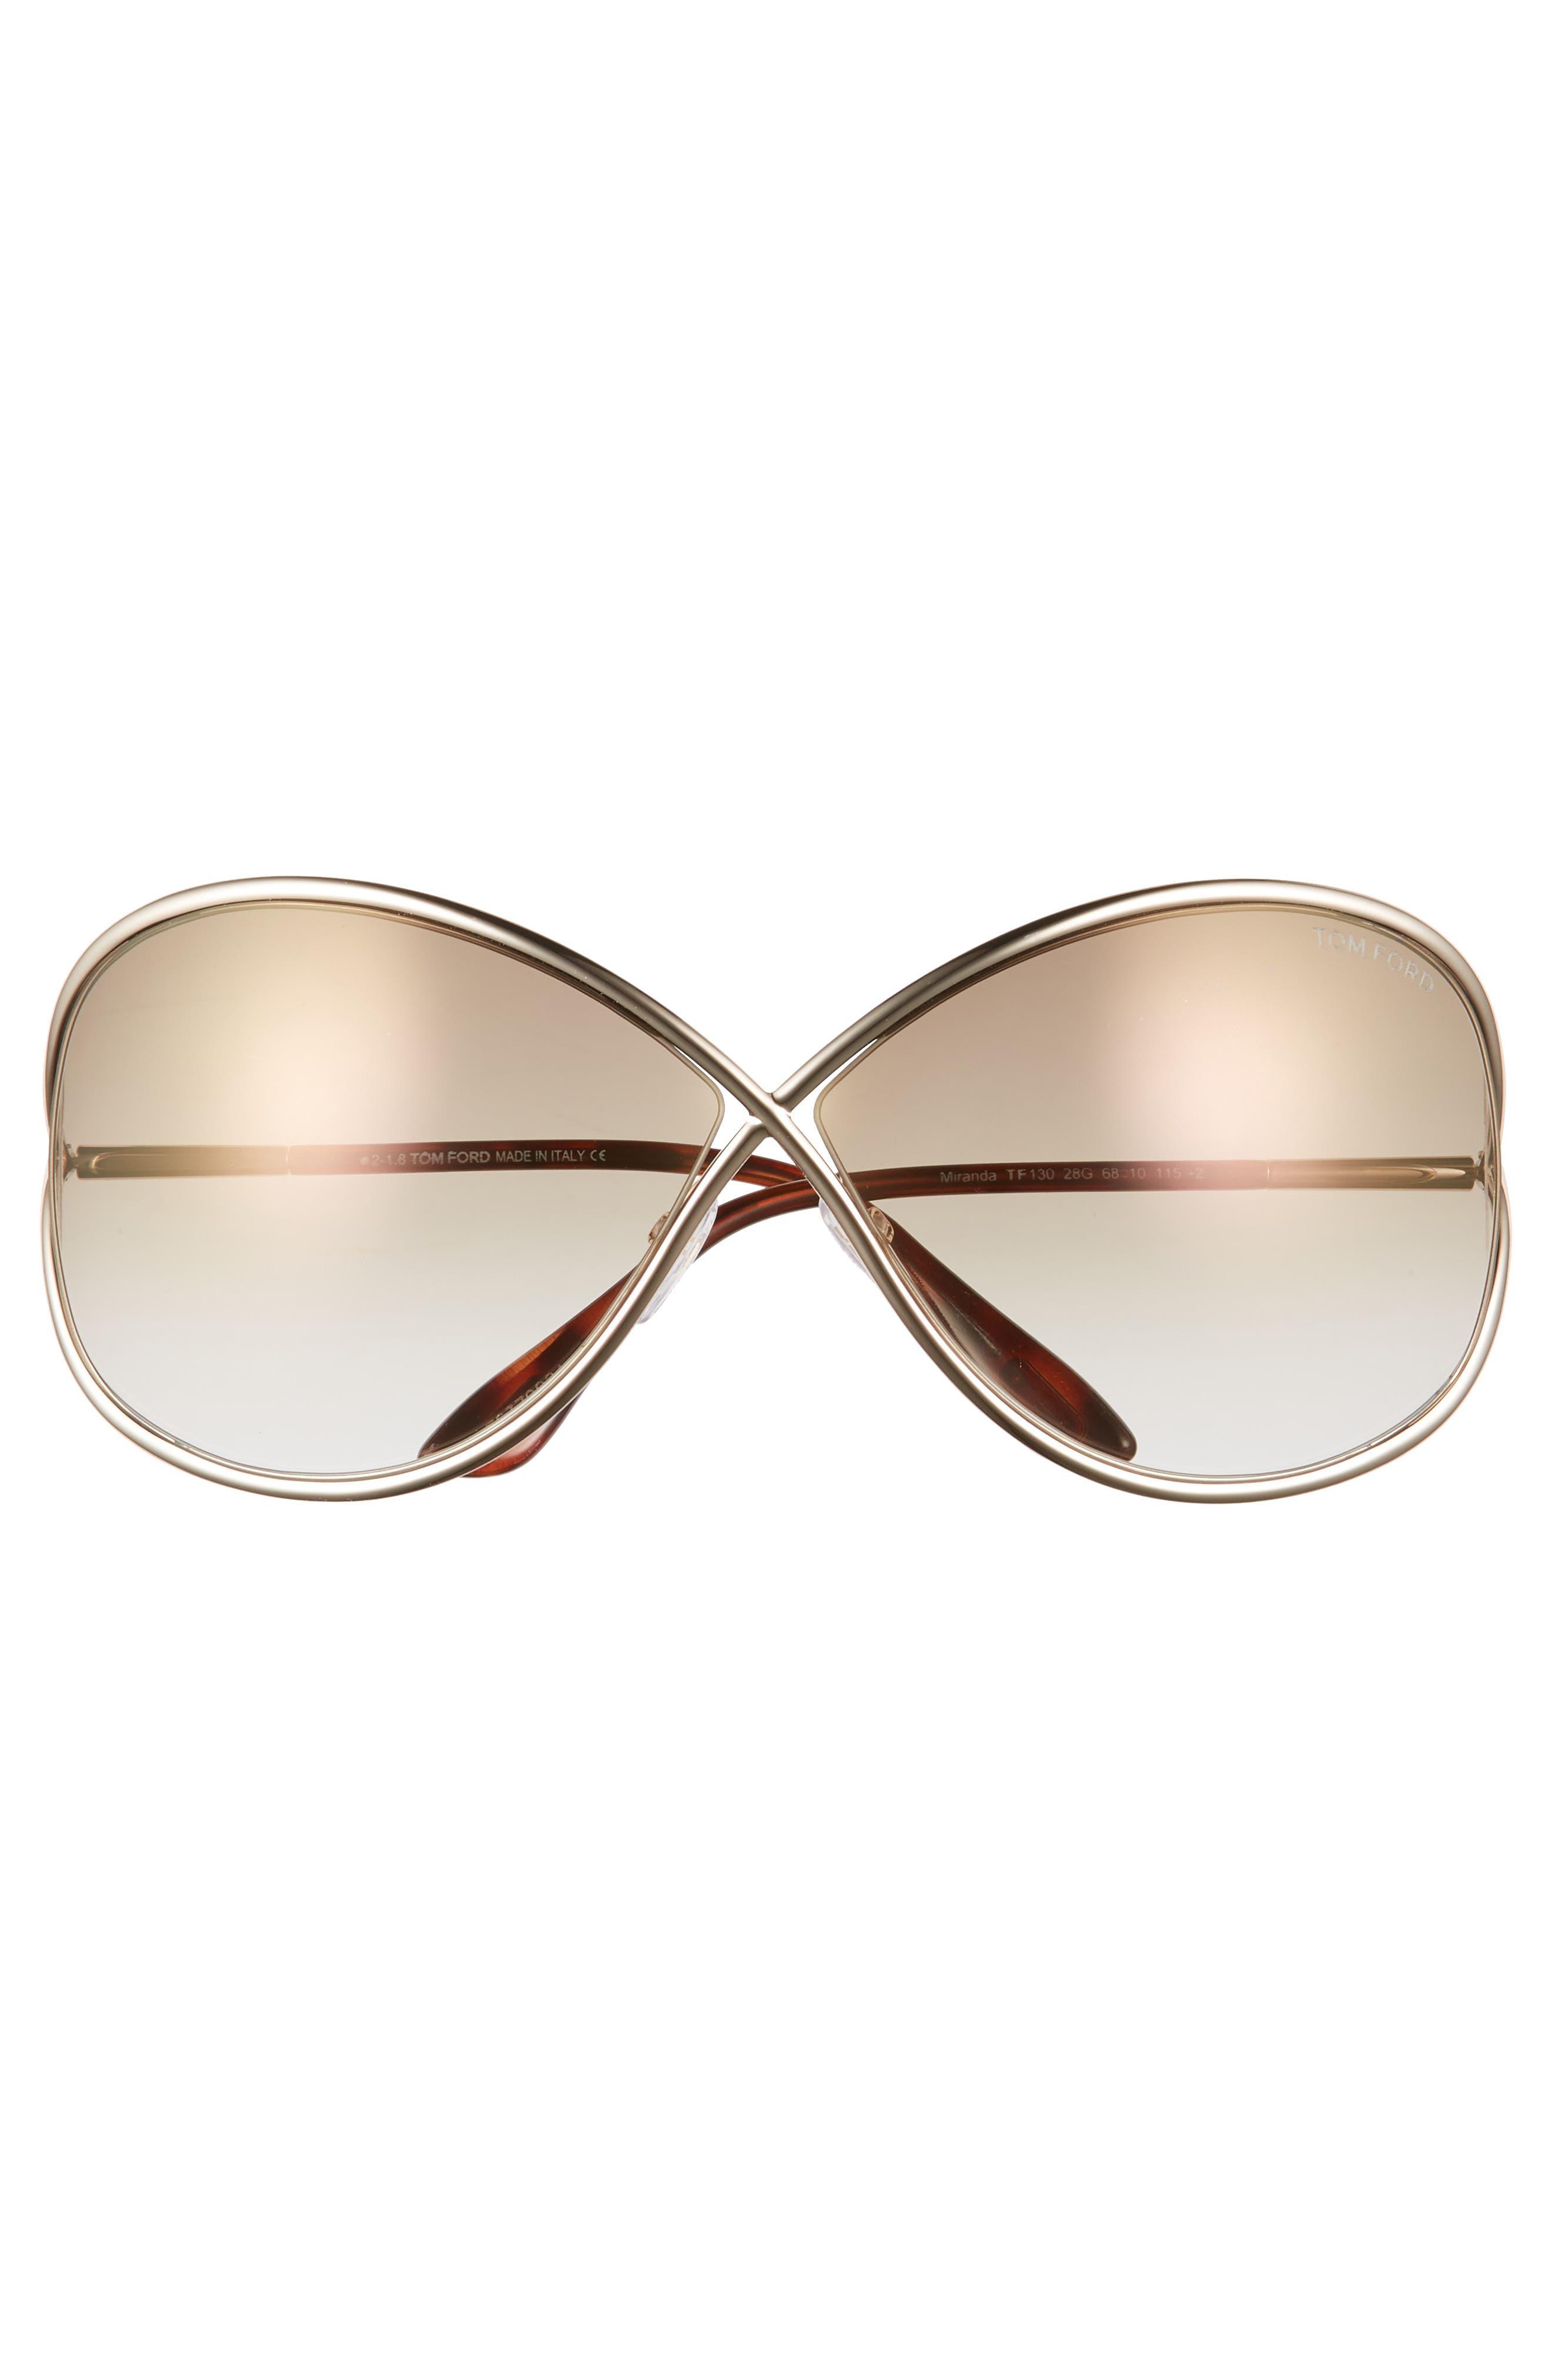 Miranda 68mm Open Temple Oversize Metal Sunglasses,                             Alternate thumbnail 3, color,                             SHINY ROSE GOLD/ BROWN